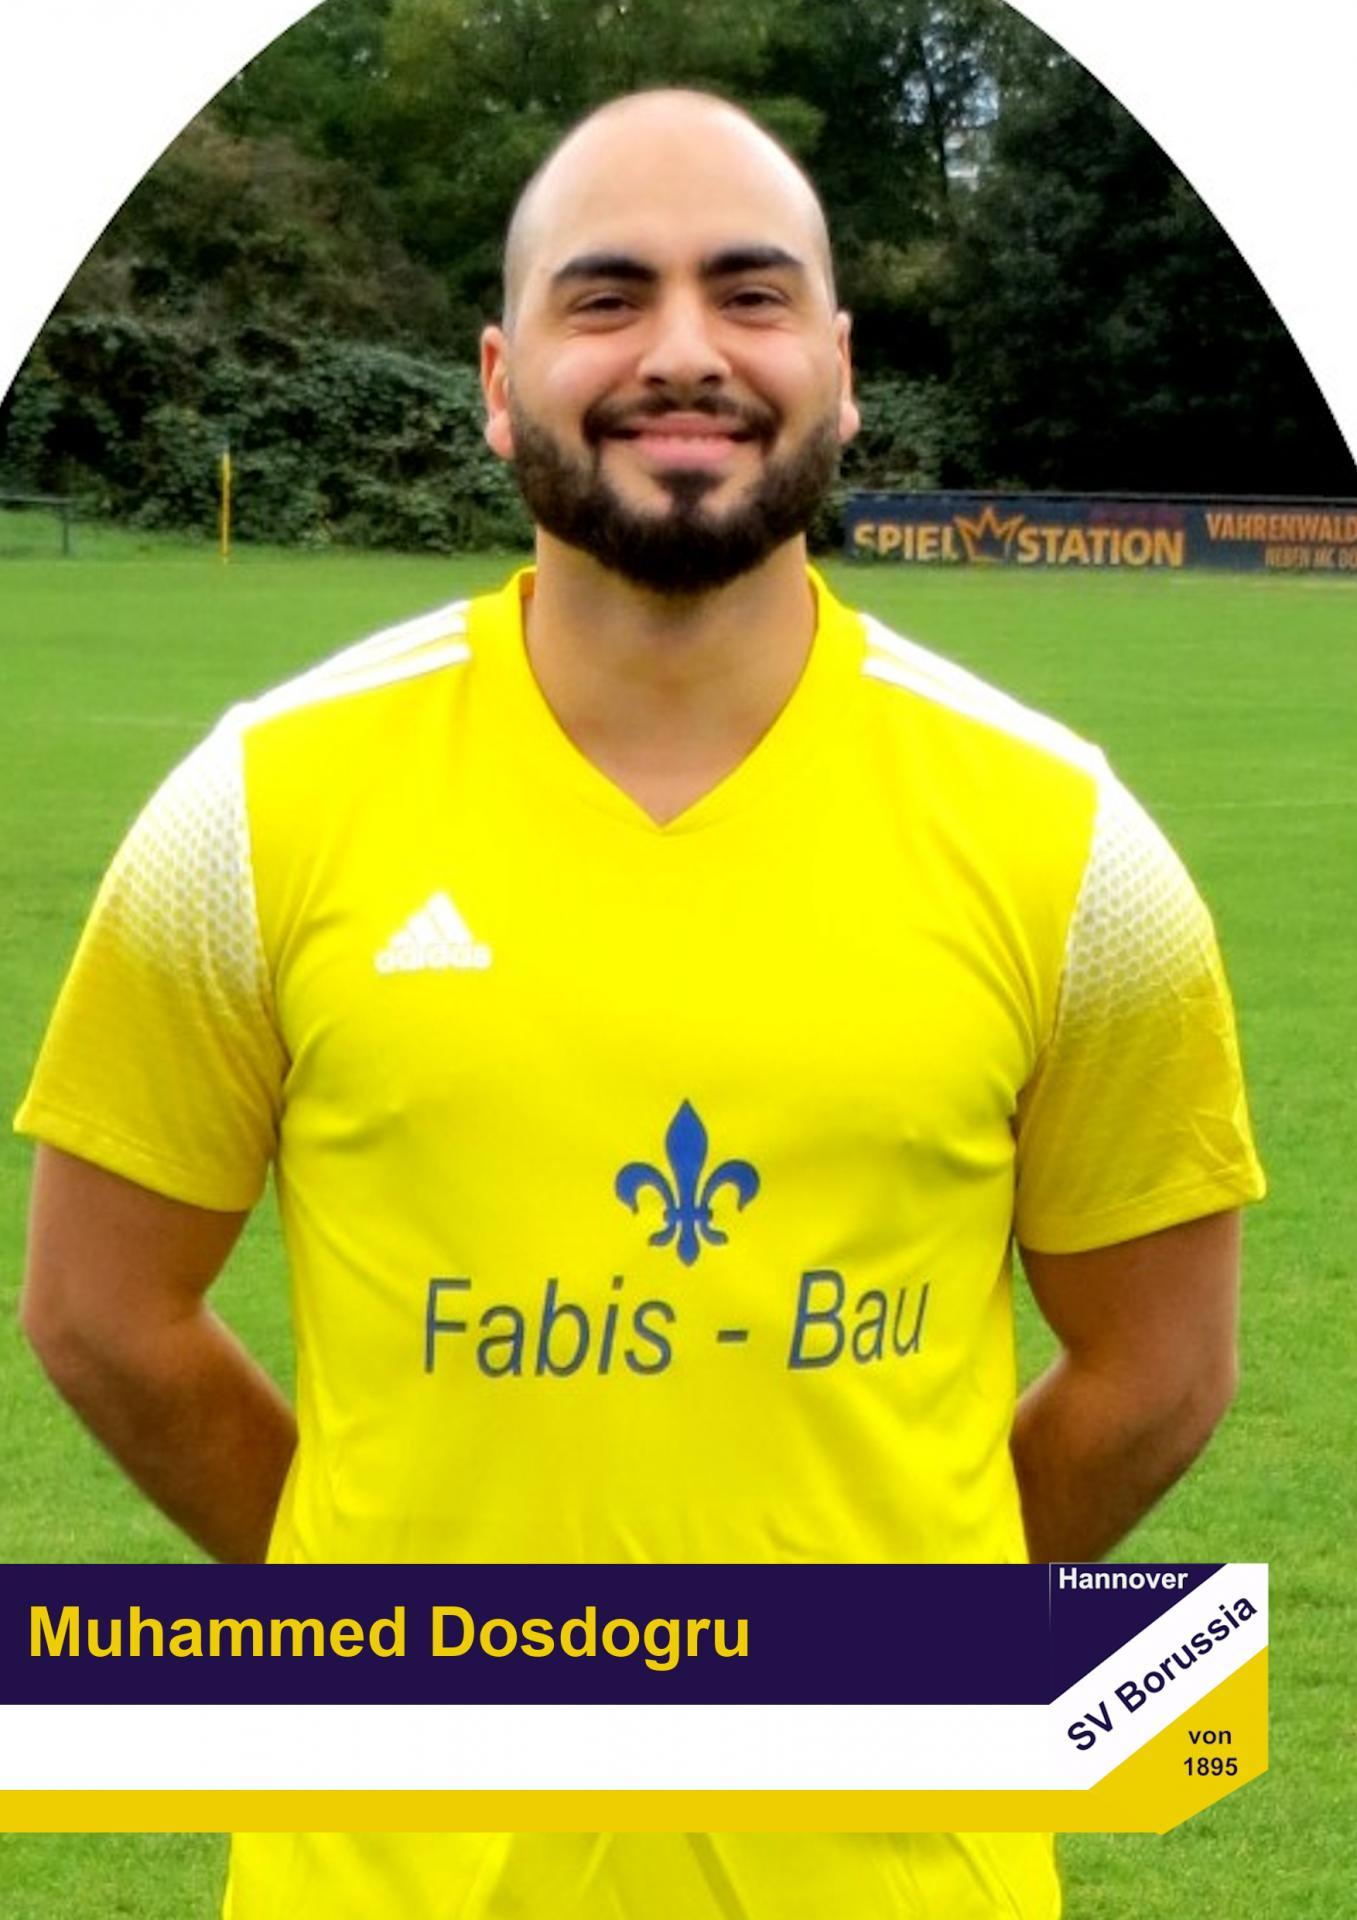 Muhammed Dosdogru